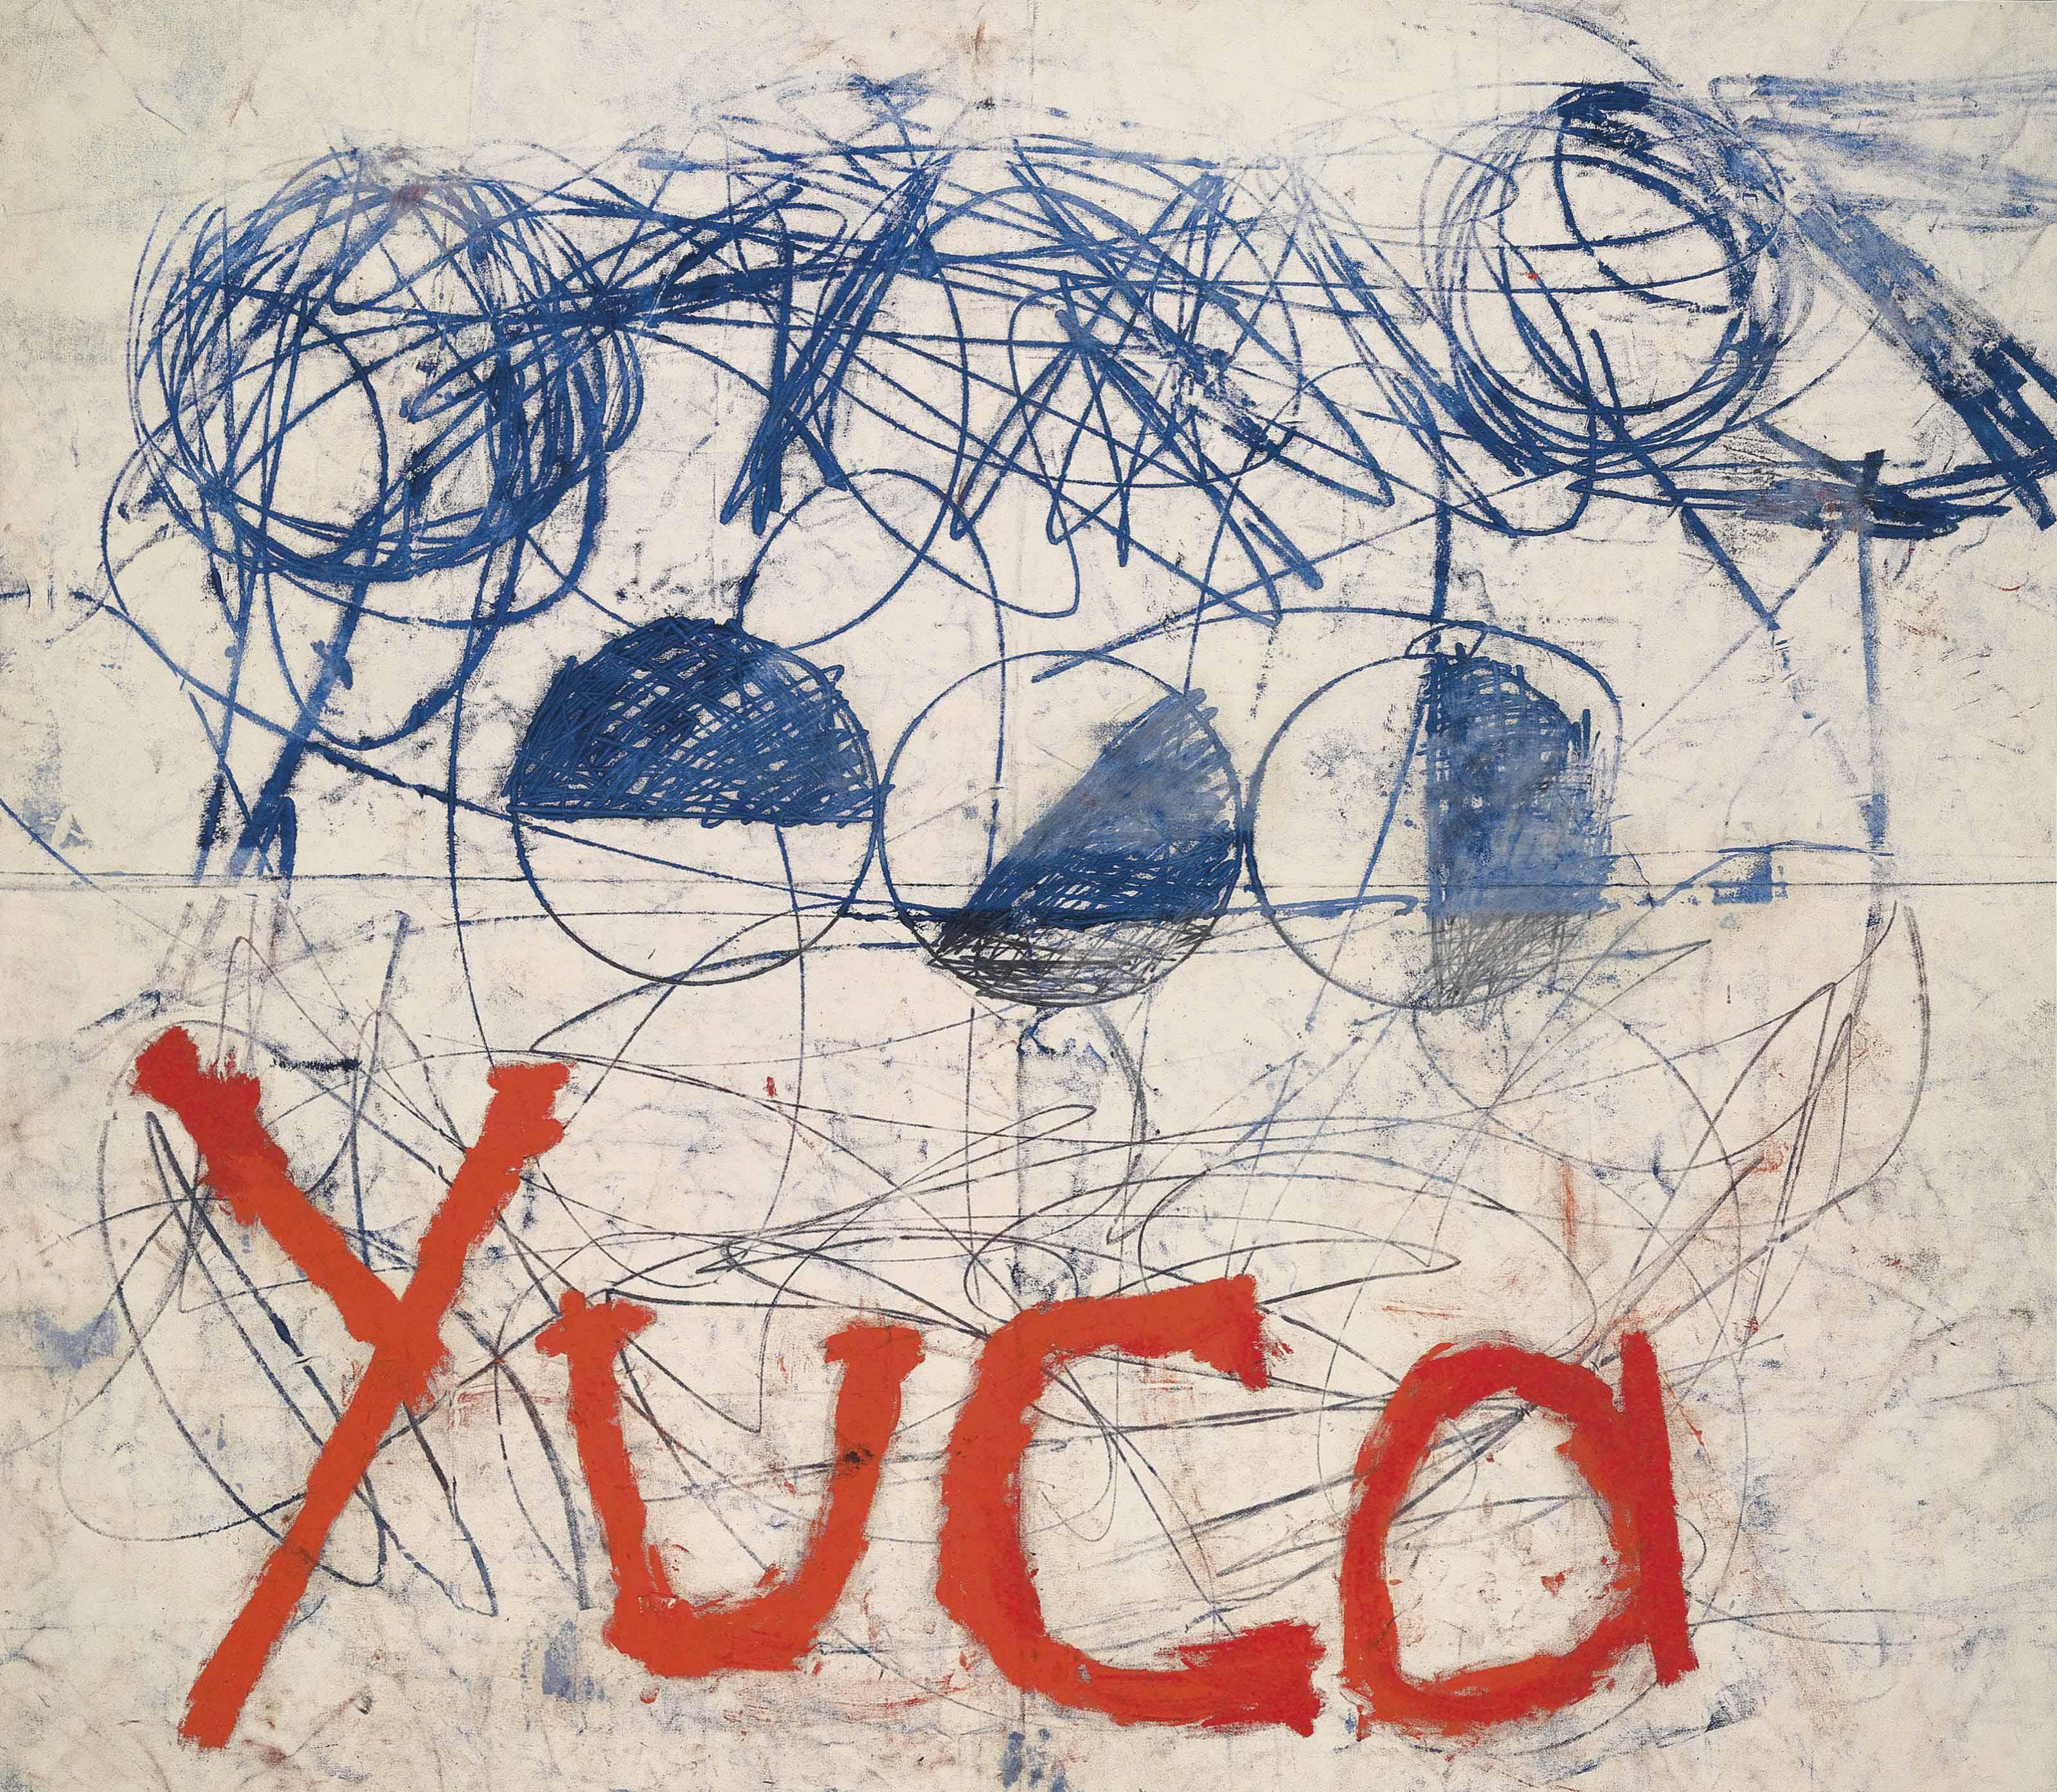 Untitled (Yuca)